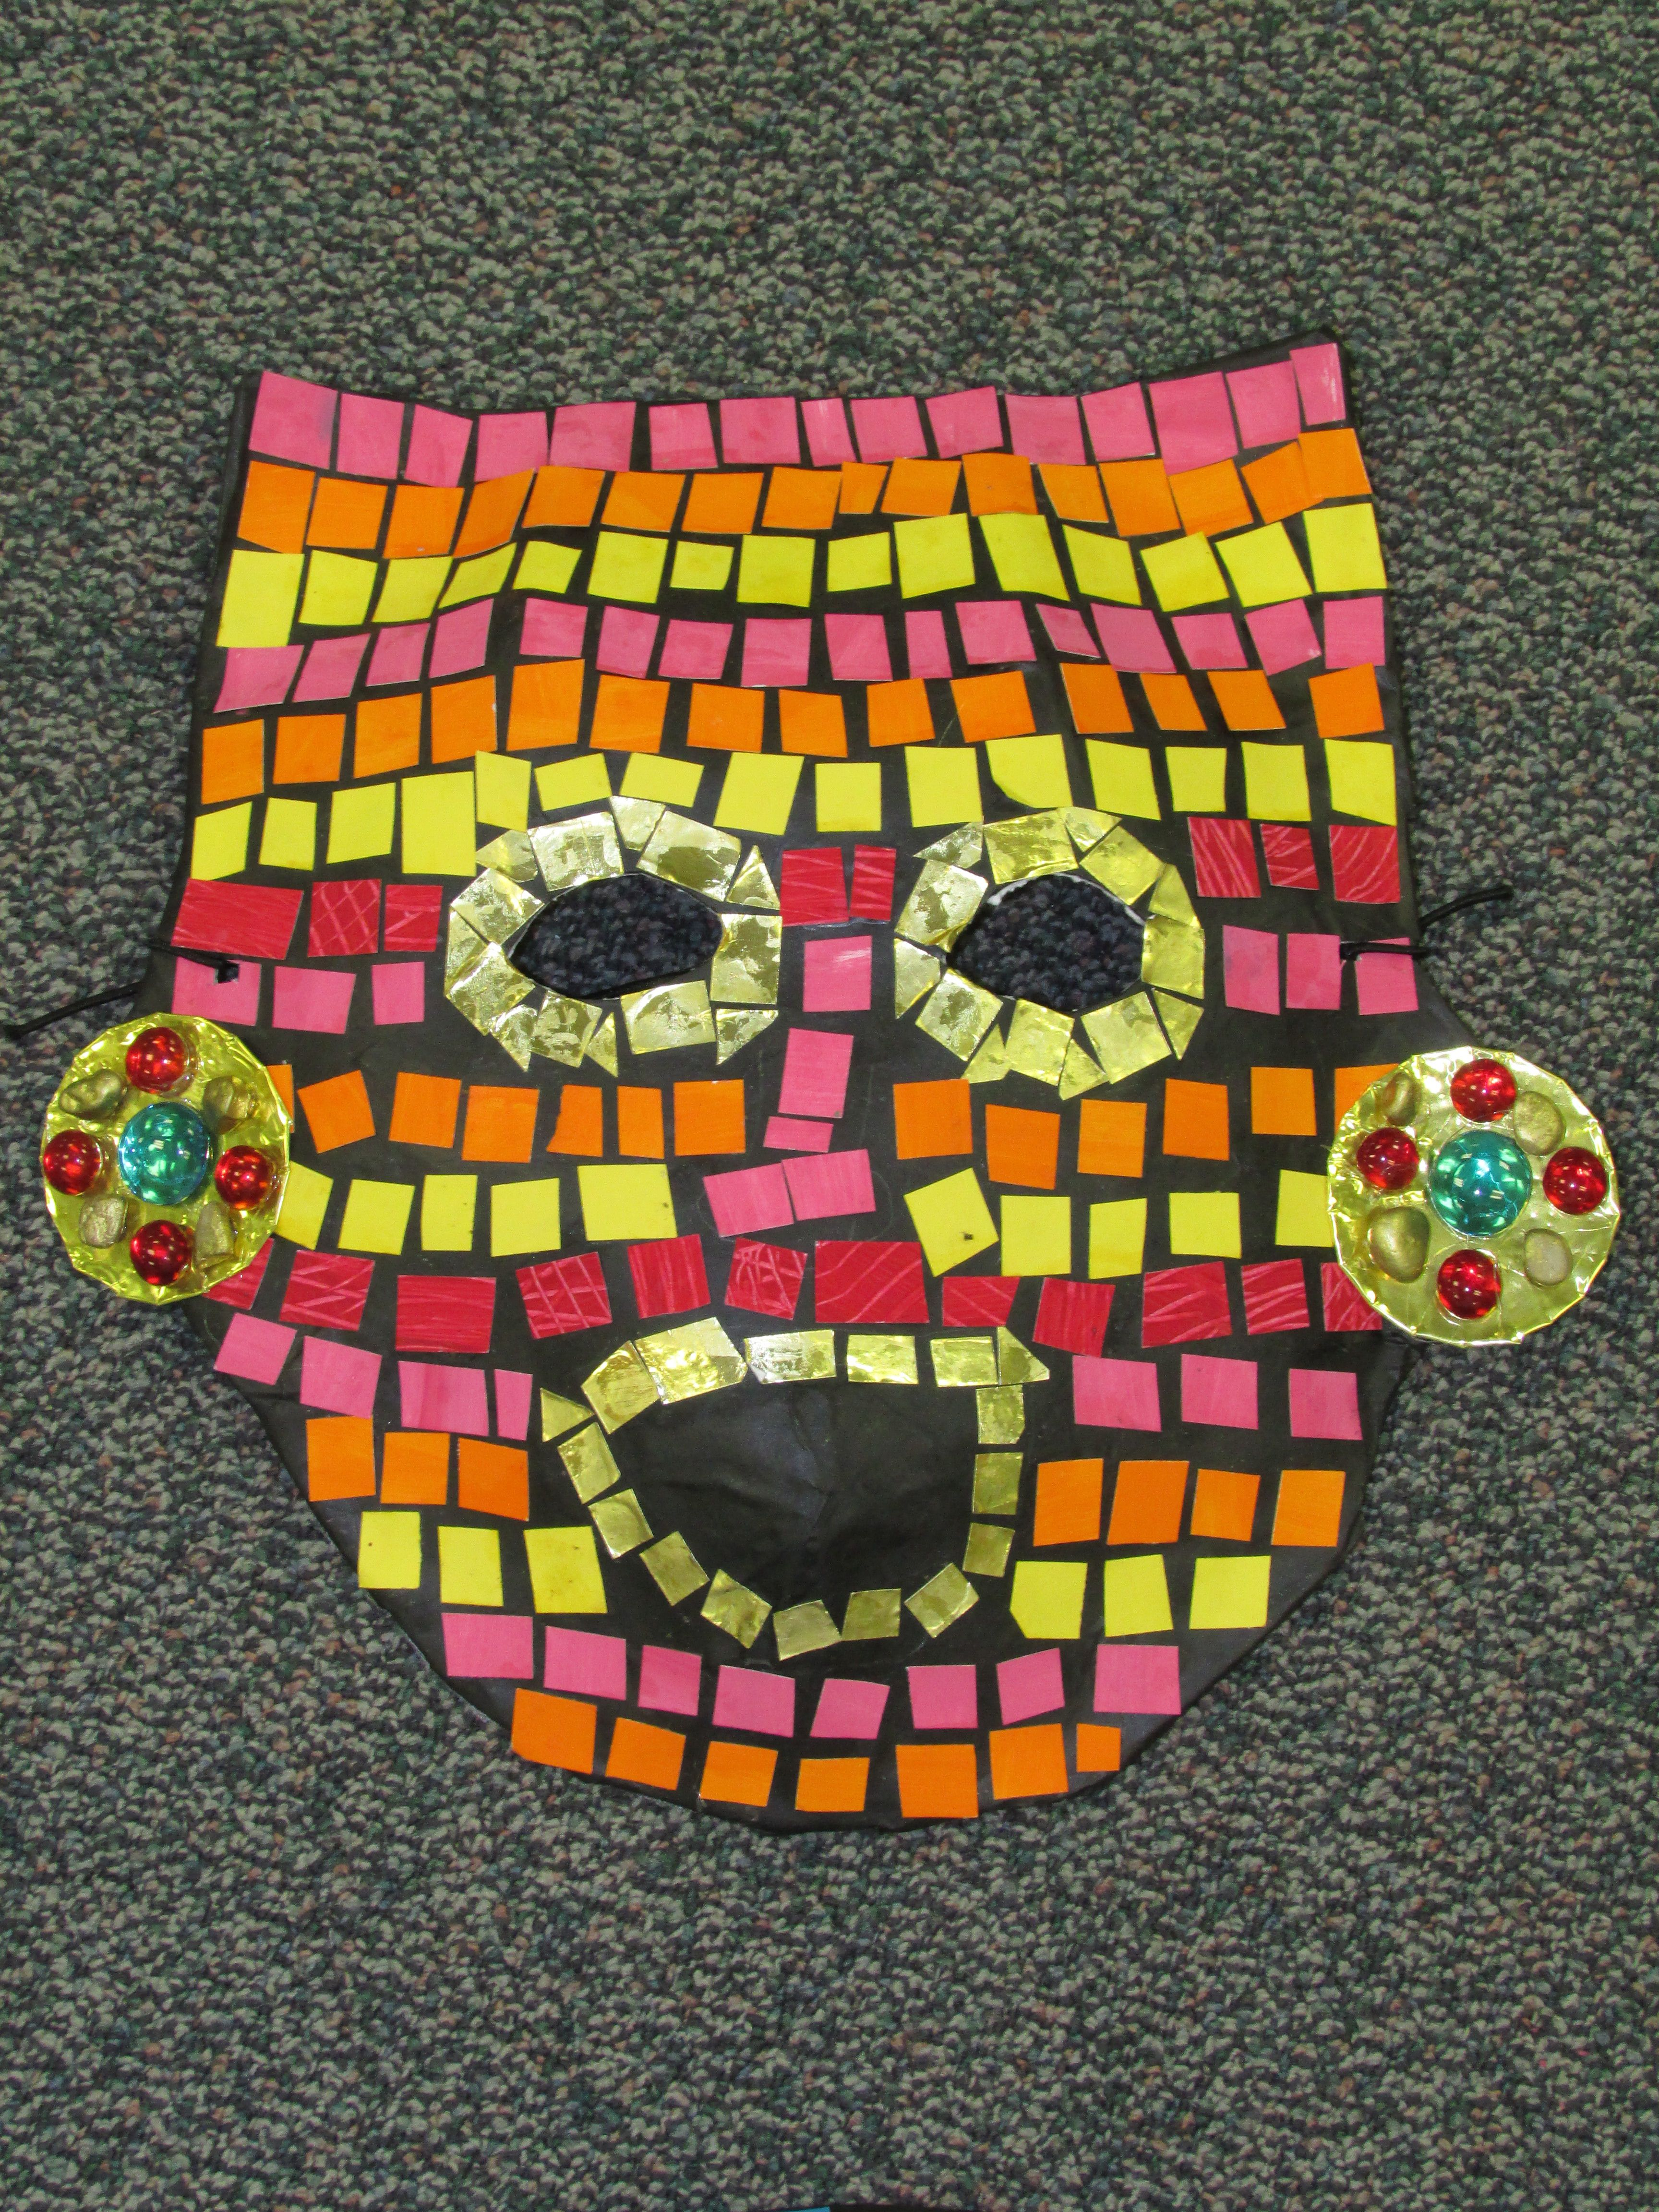 Aztec Calendar Art Lesson : Rd grade paper mache mosaic ancient mayan mask lesson by